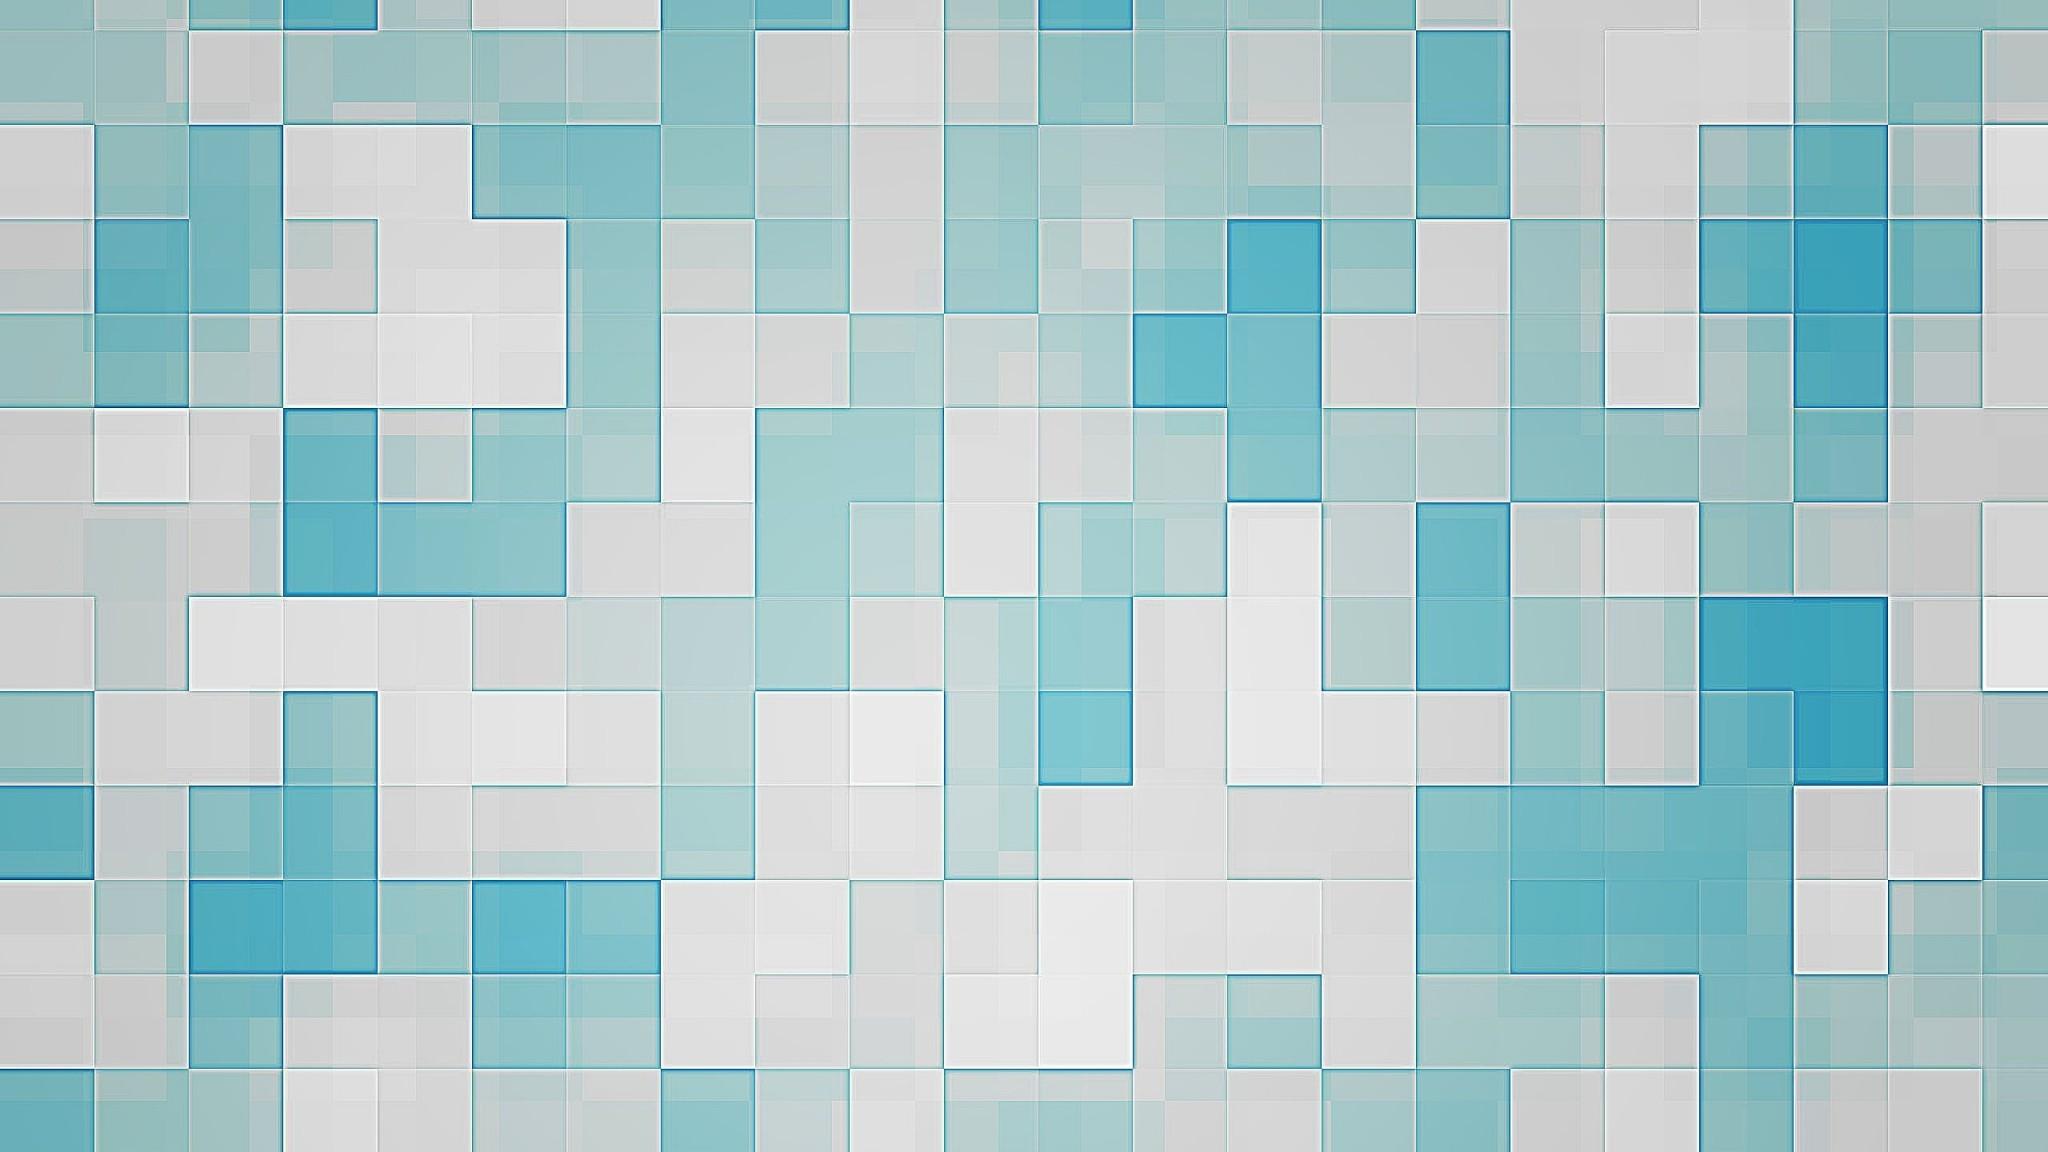 Wallpaper pixels, square, shape, color, shades